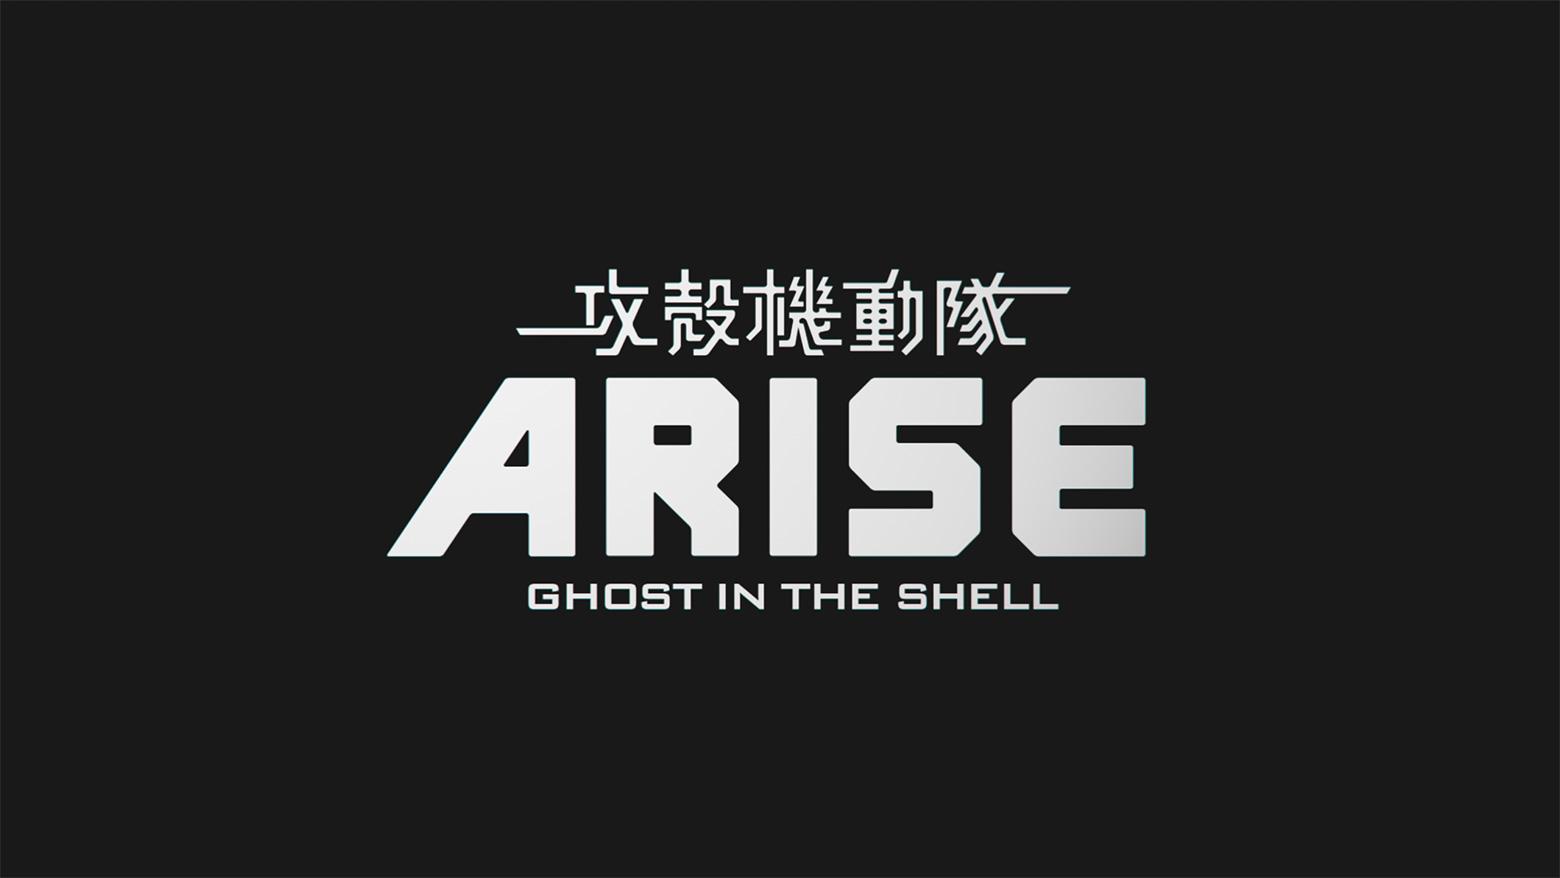 ghostintheShell_05